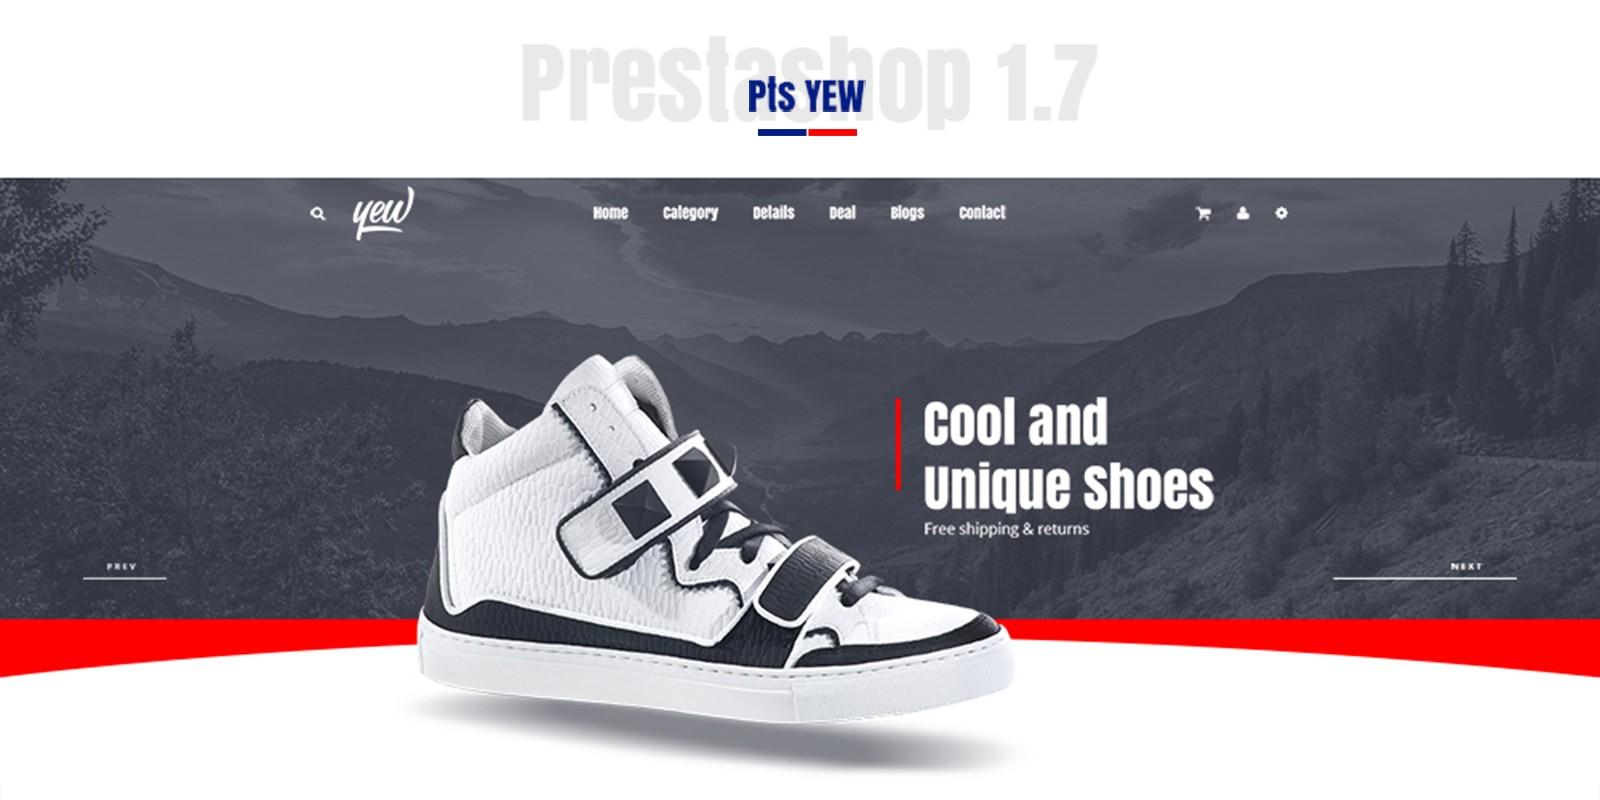 Pts Yew PrestaShop Fashion Theme